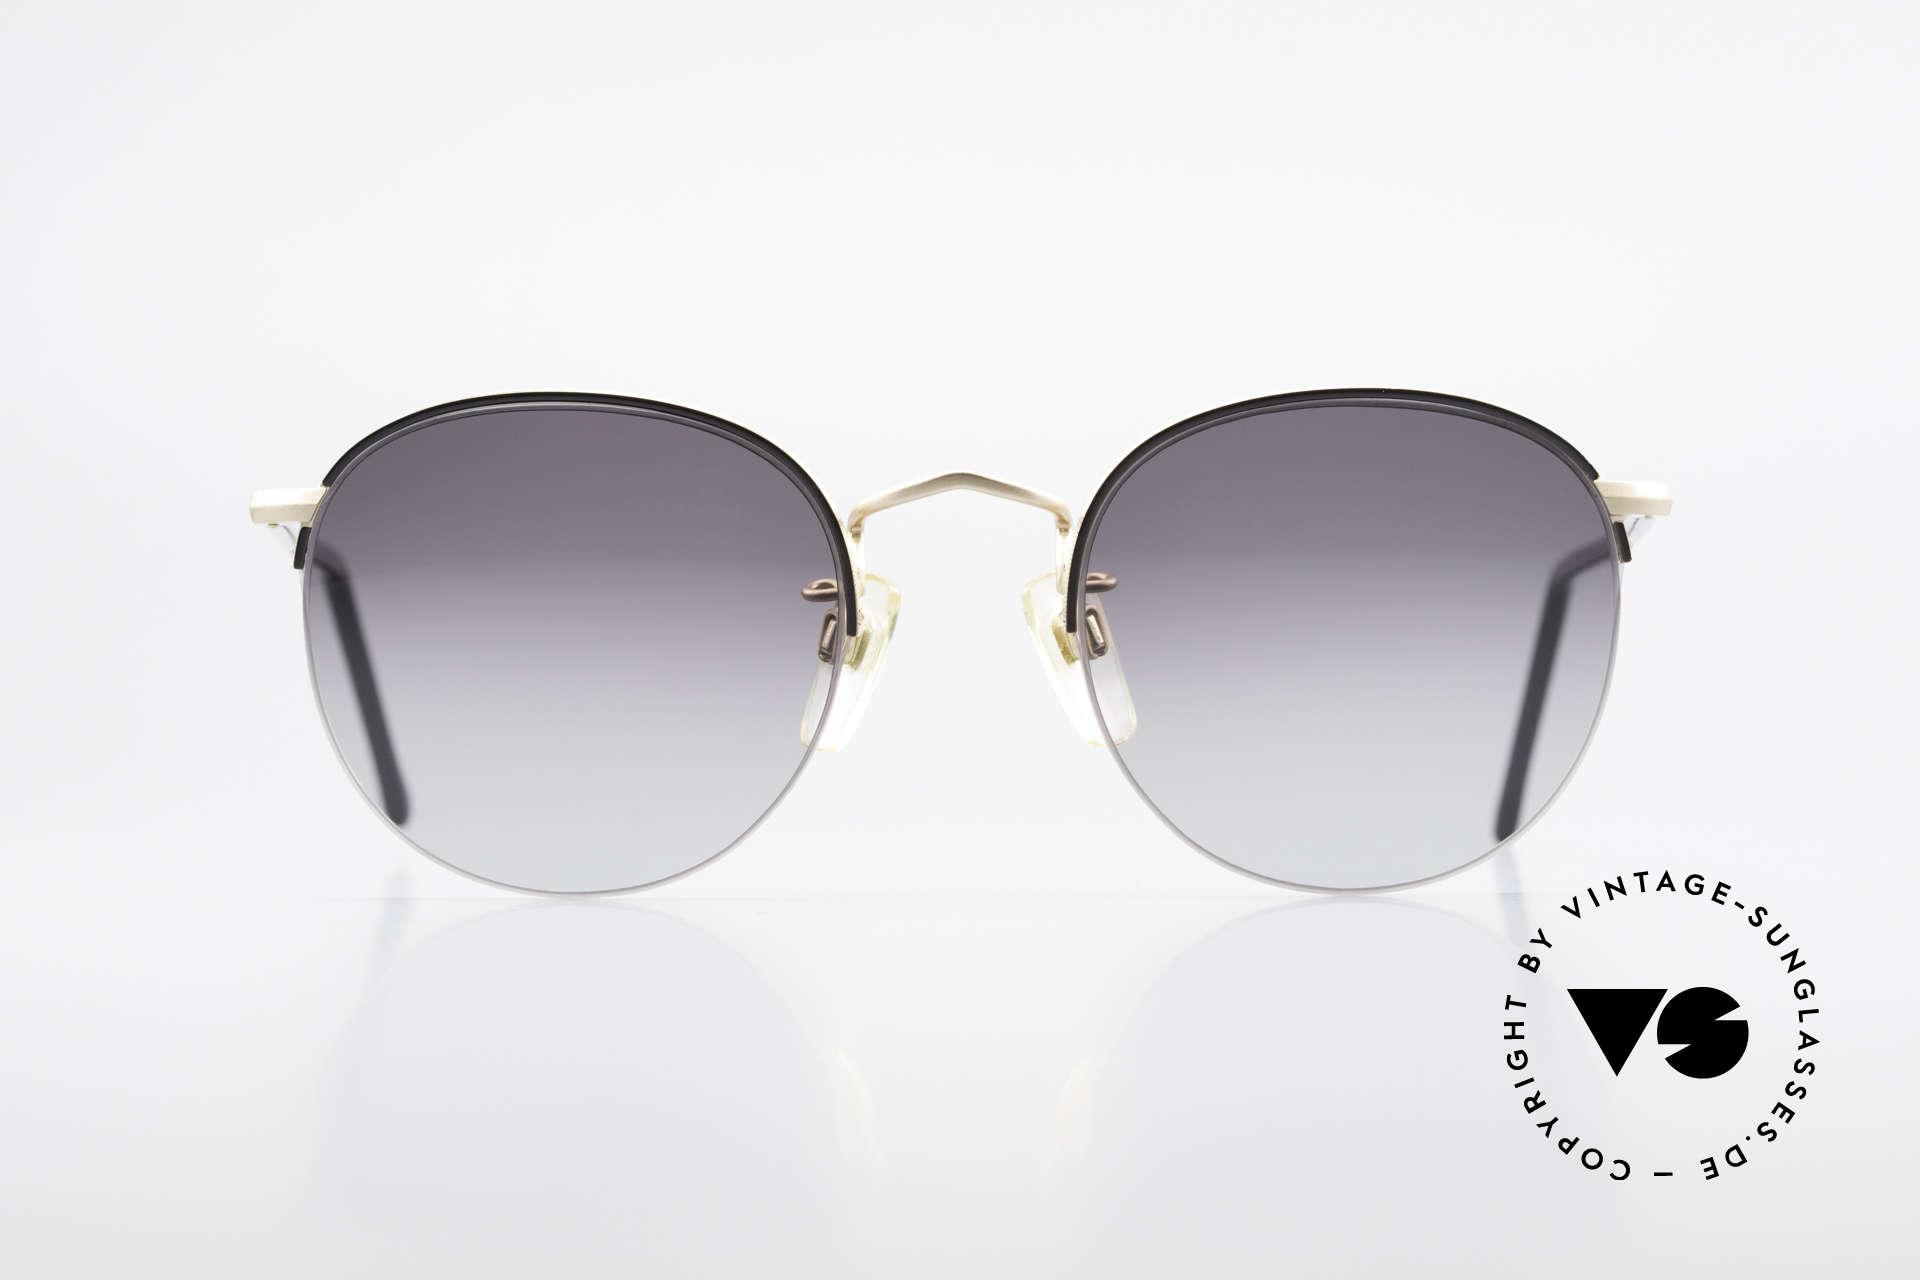 Giorgio Armani 142 Rimless Panto Sunglasses 80's, round 'panto design' with discreet elegant coloring, Made for Men